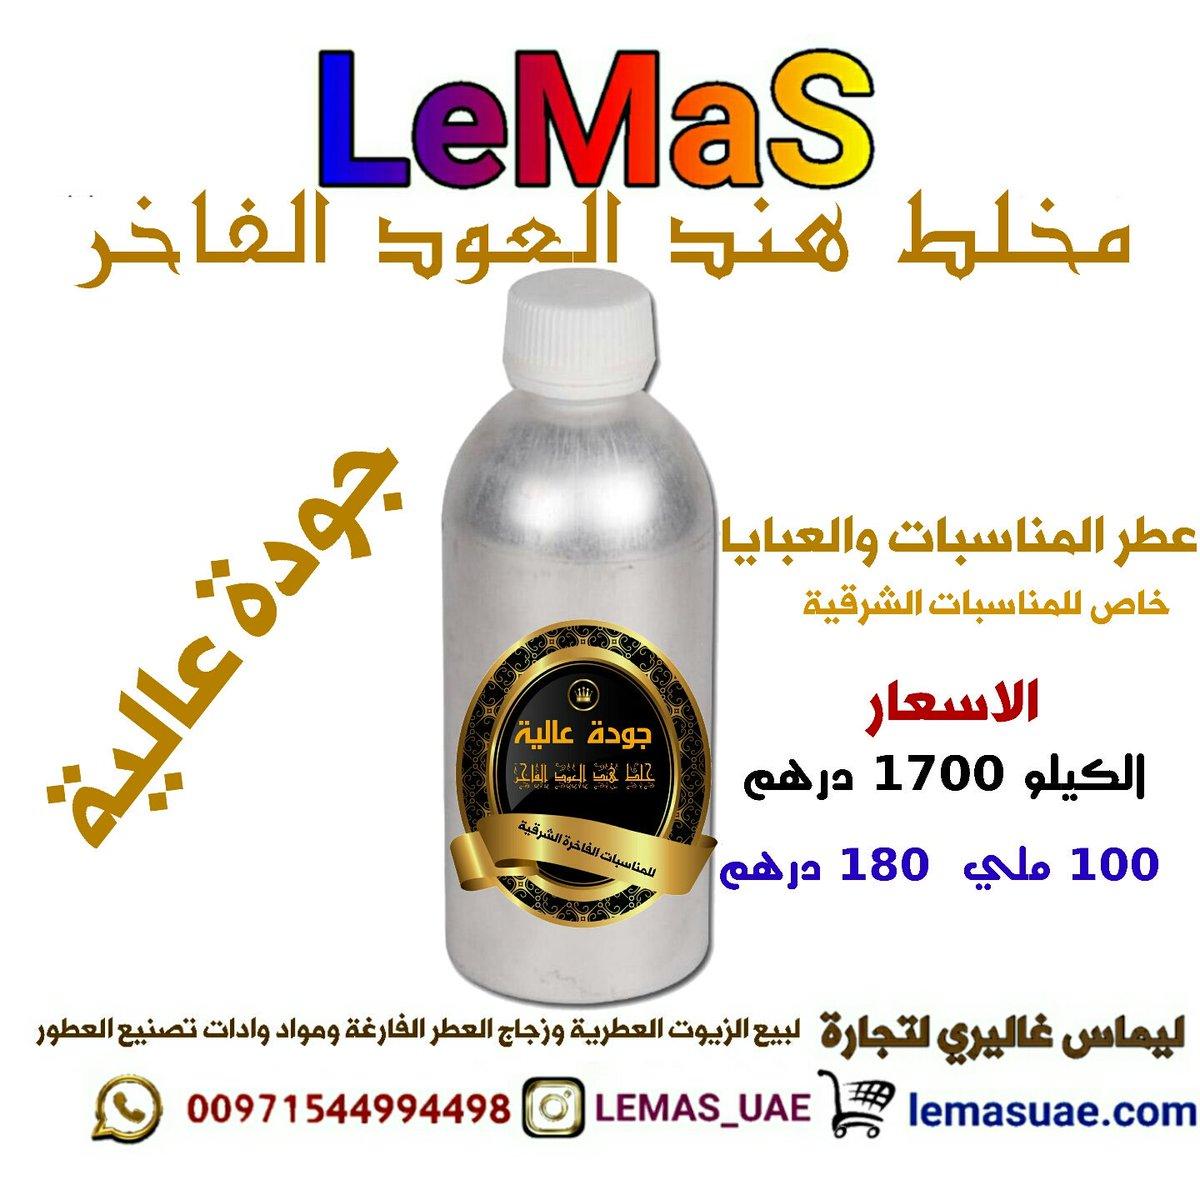 53521001b ليماس التجارية (@limasuae1)   Twitter